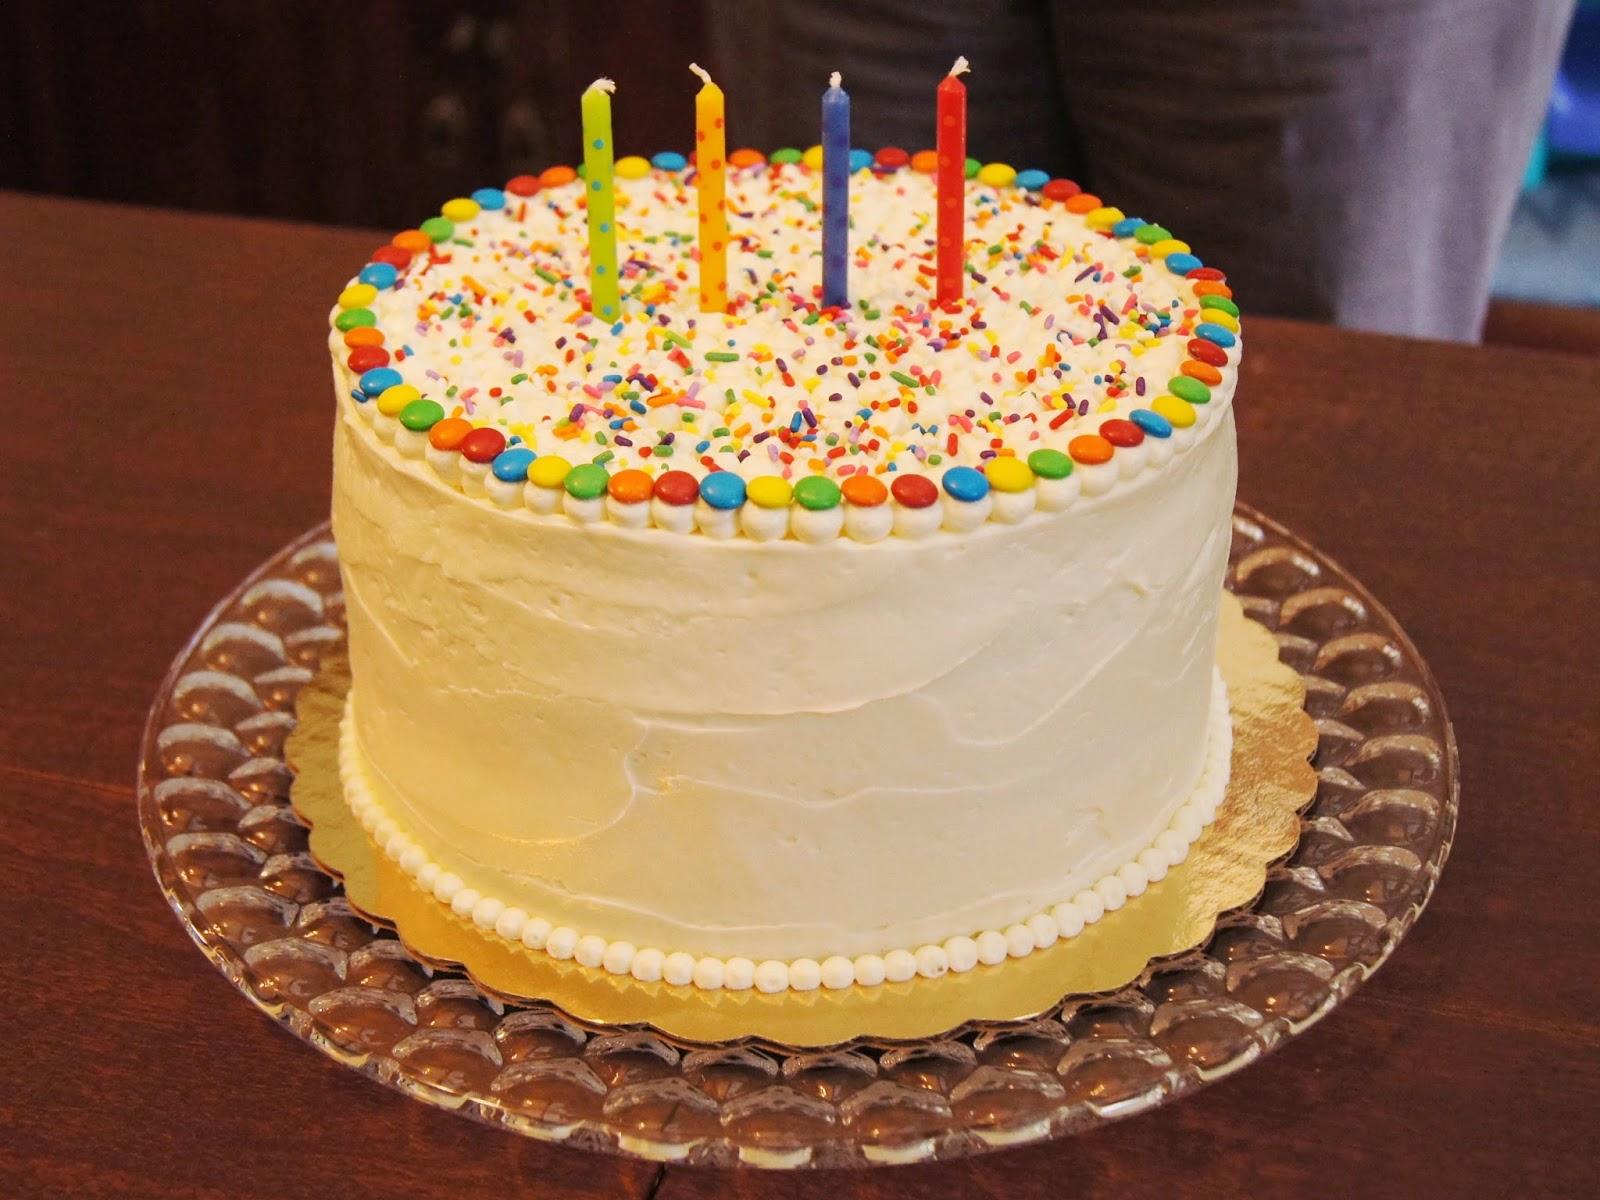 ... Cake and Hazelnut Cake with Praline and Milk Chocolate Buttercream